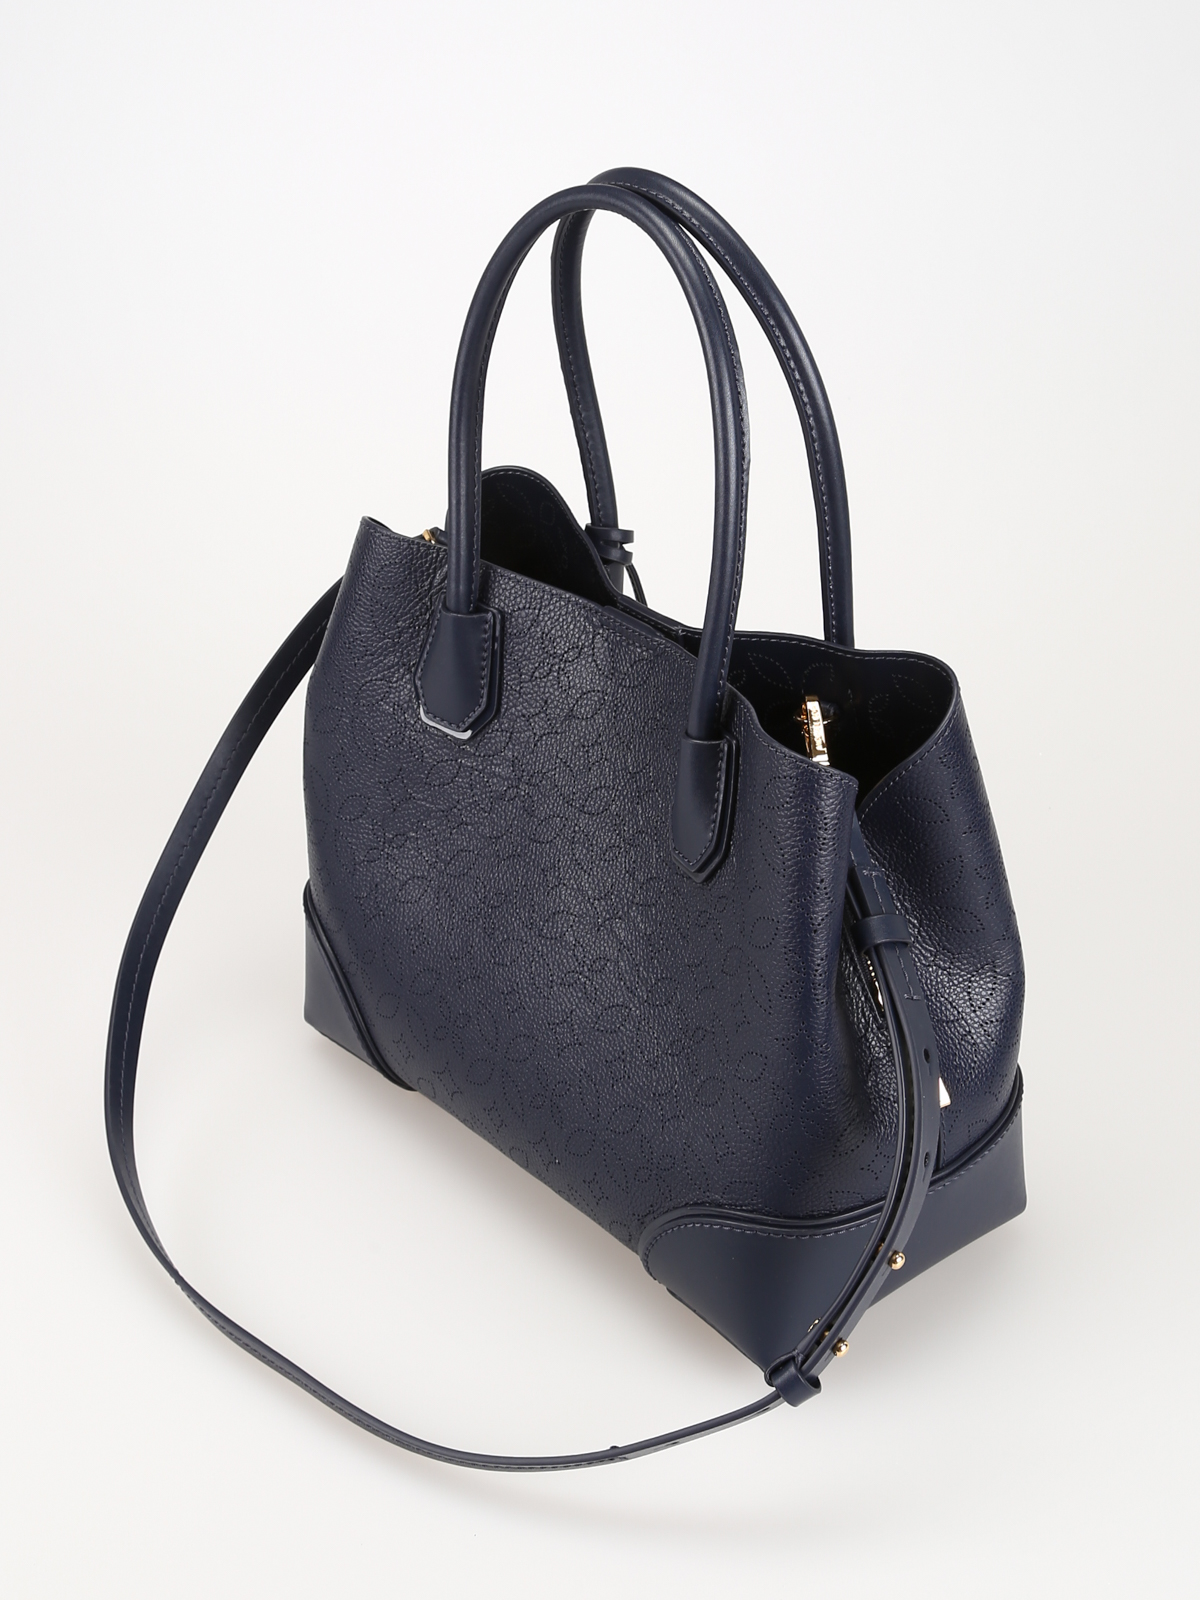 12f652e18c52 iKRIX MICHAEL KORS: totes bags - Admiral blue Mercer Gallery medium bag